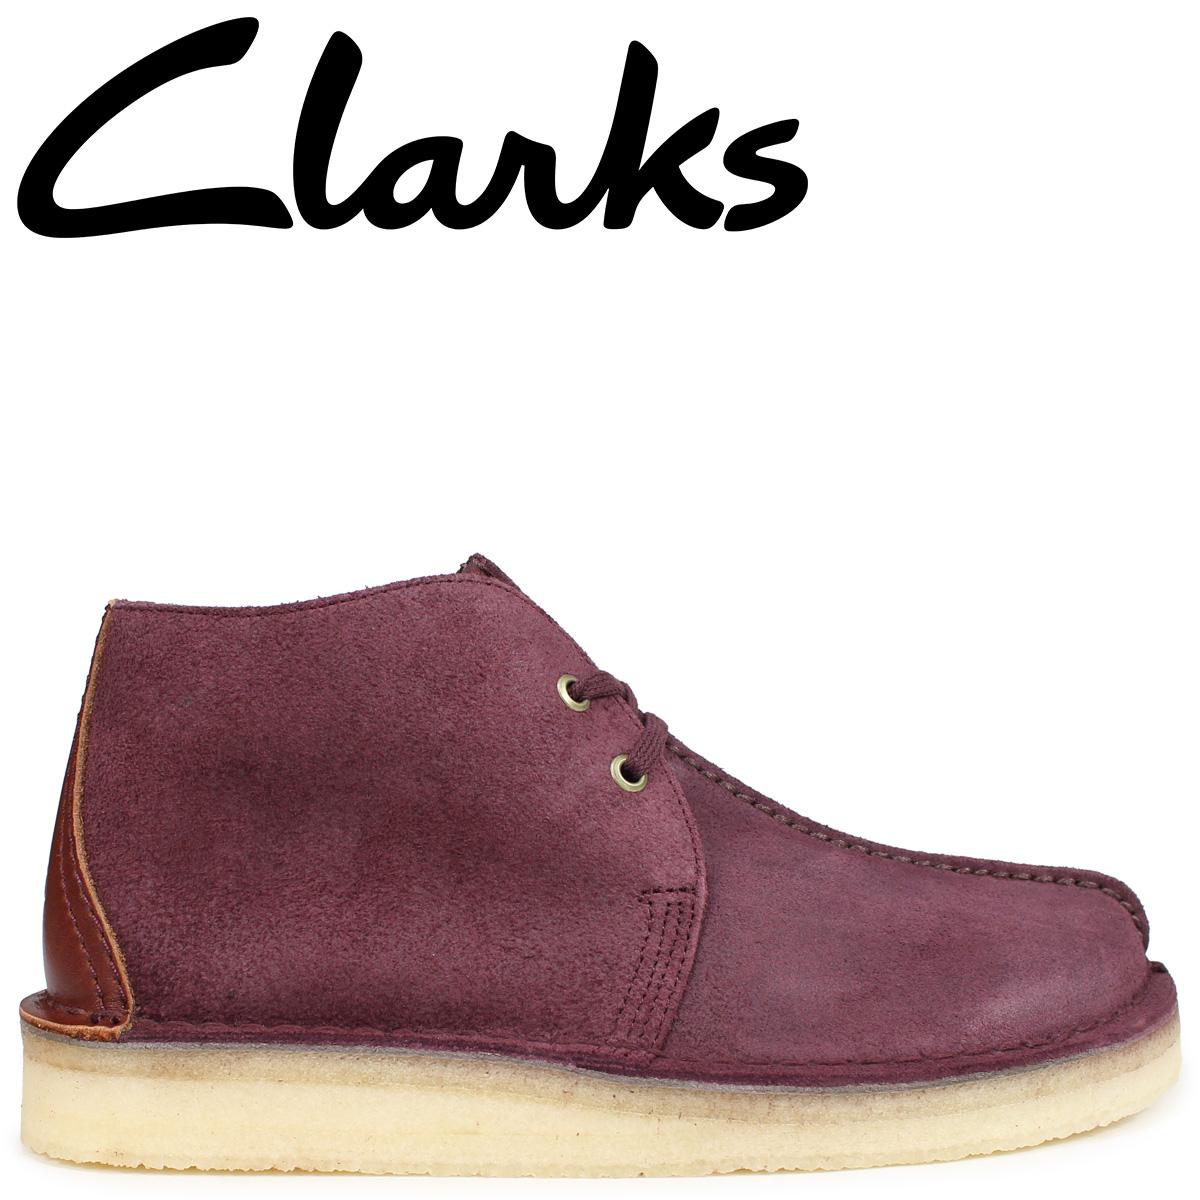 Clarks デザートトレックハイ ブーツ メンズ クラークス DESERT TREK HI 26134941 バーガンディ